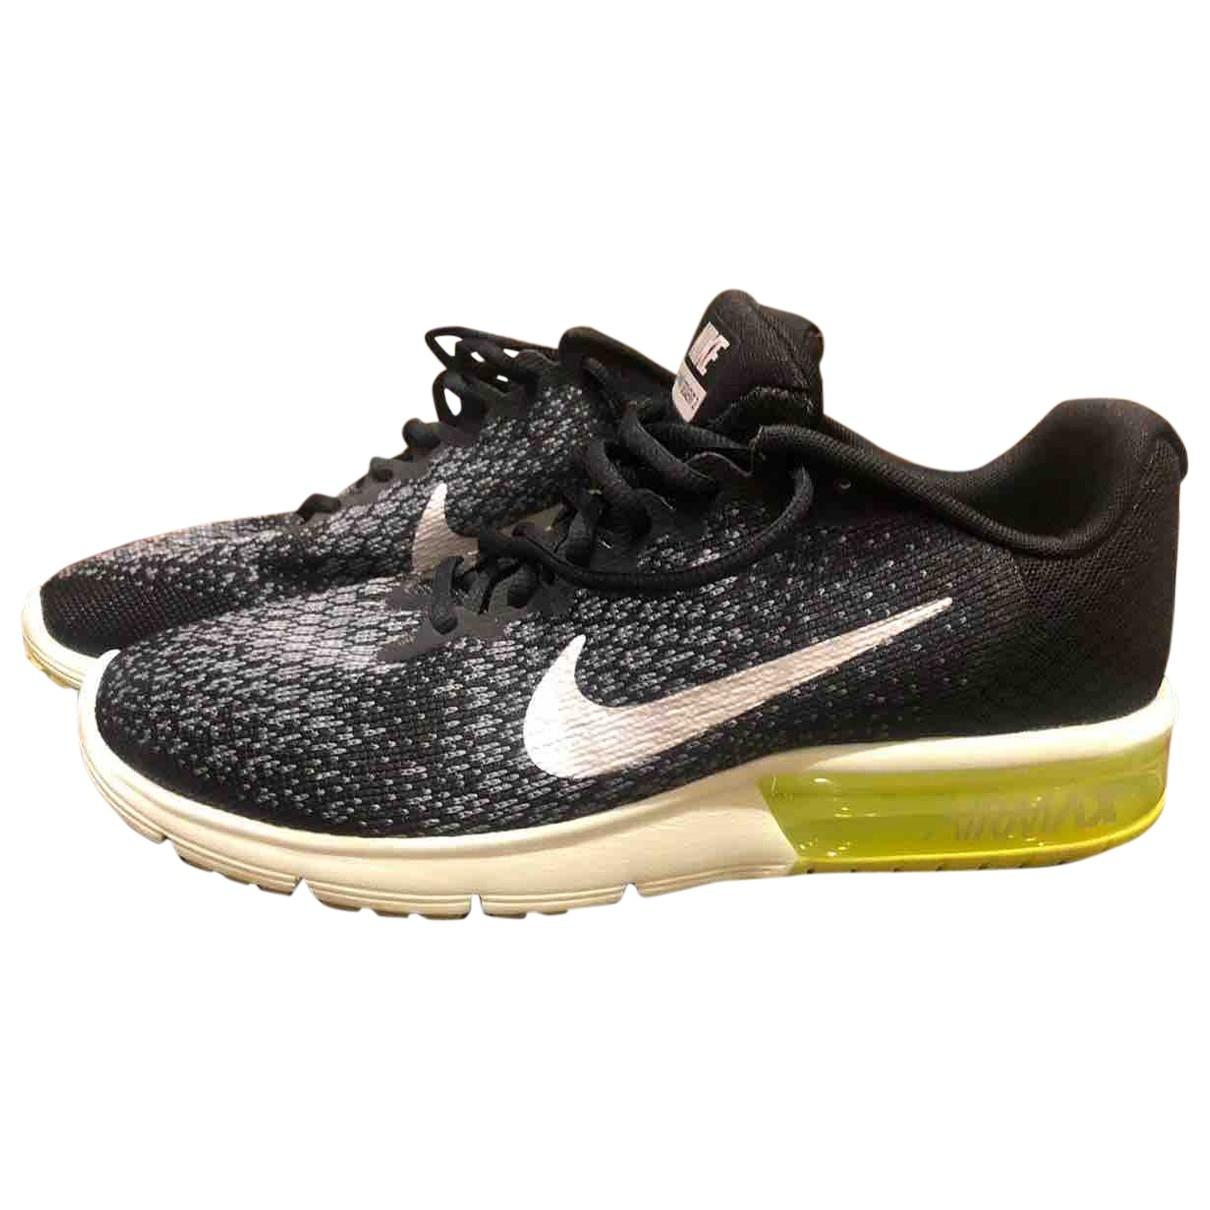 Nike Air Max  Black Cloth Trainers for Men 42.5 EU